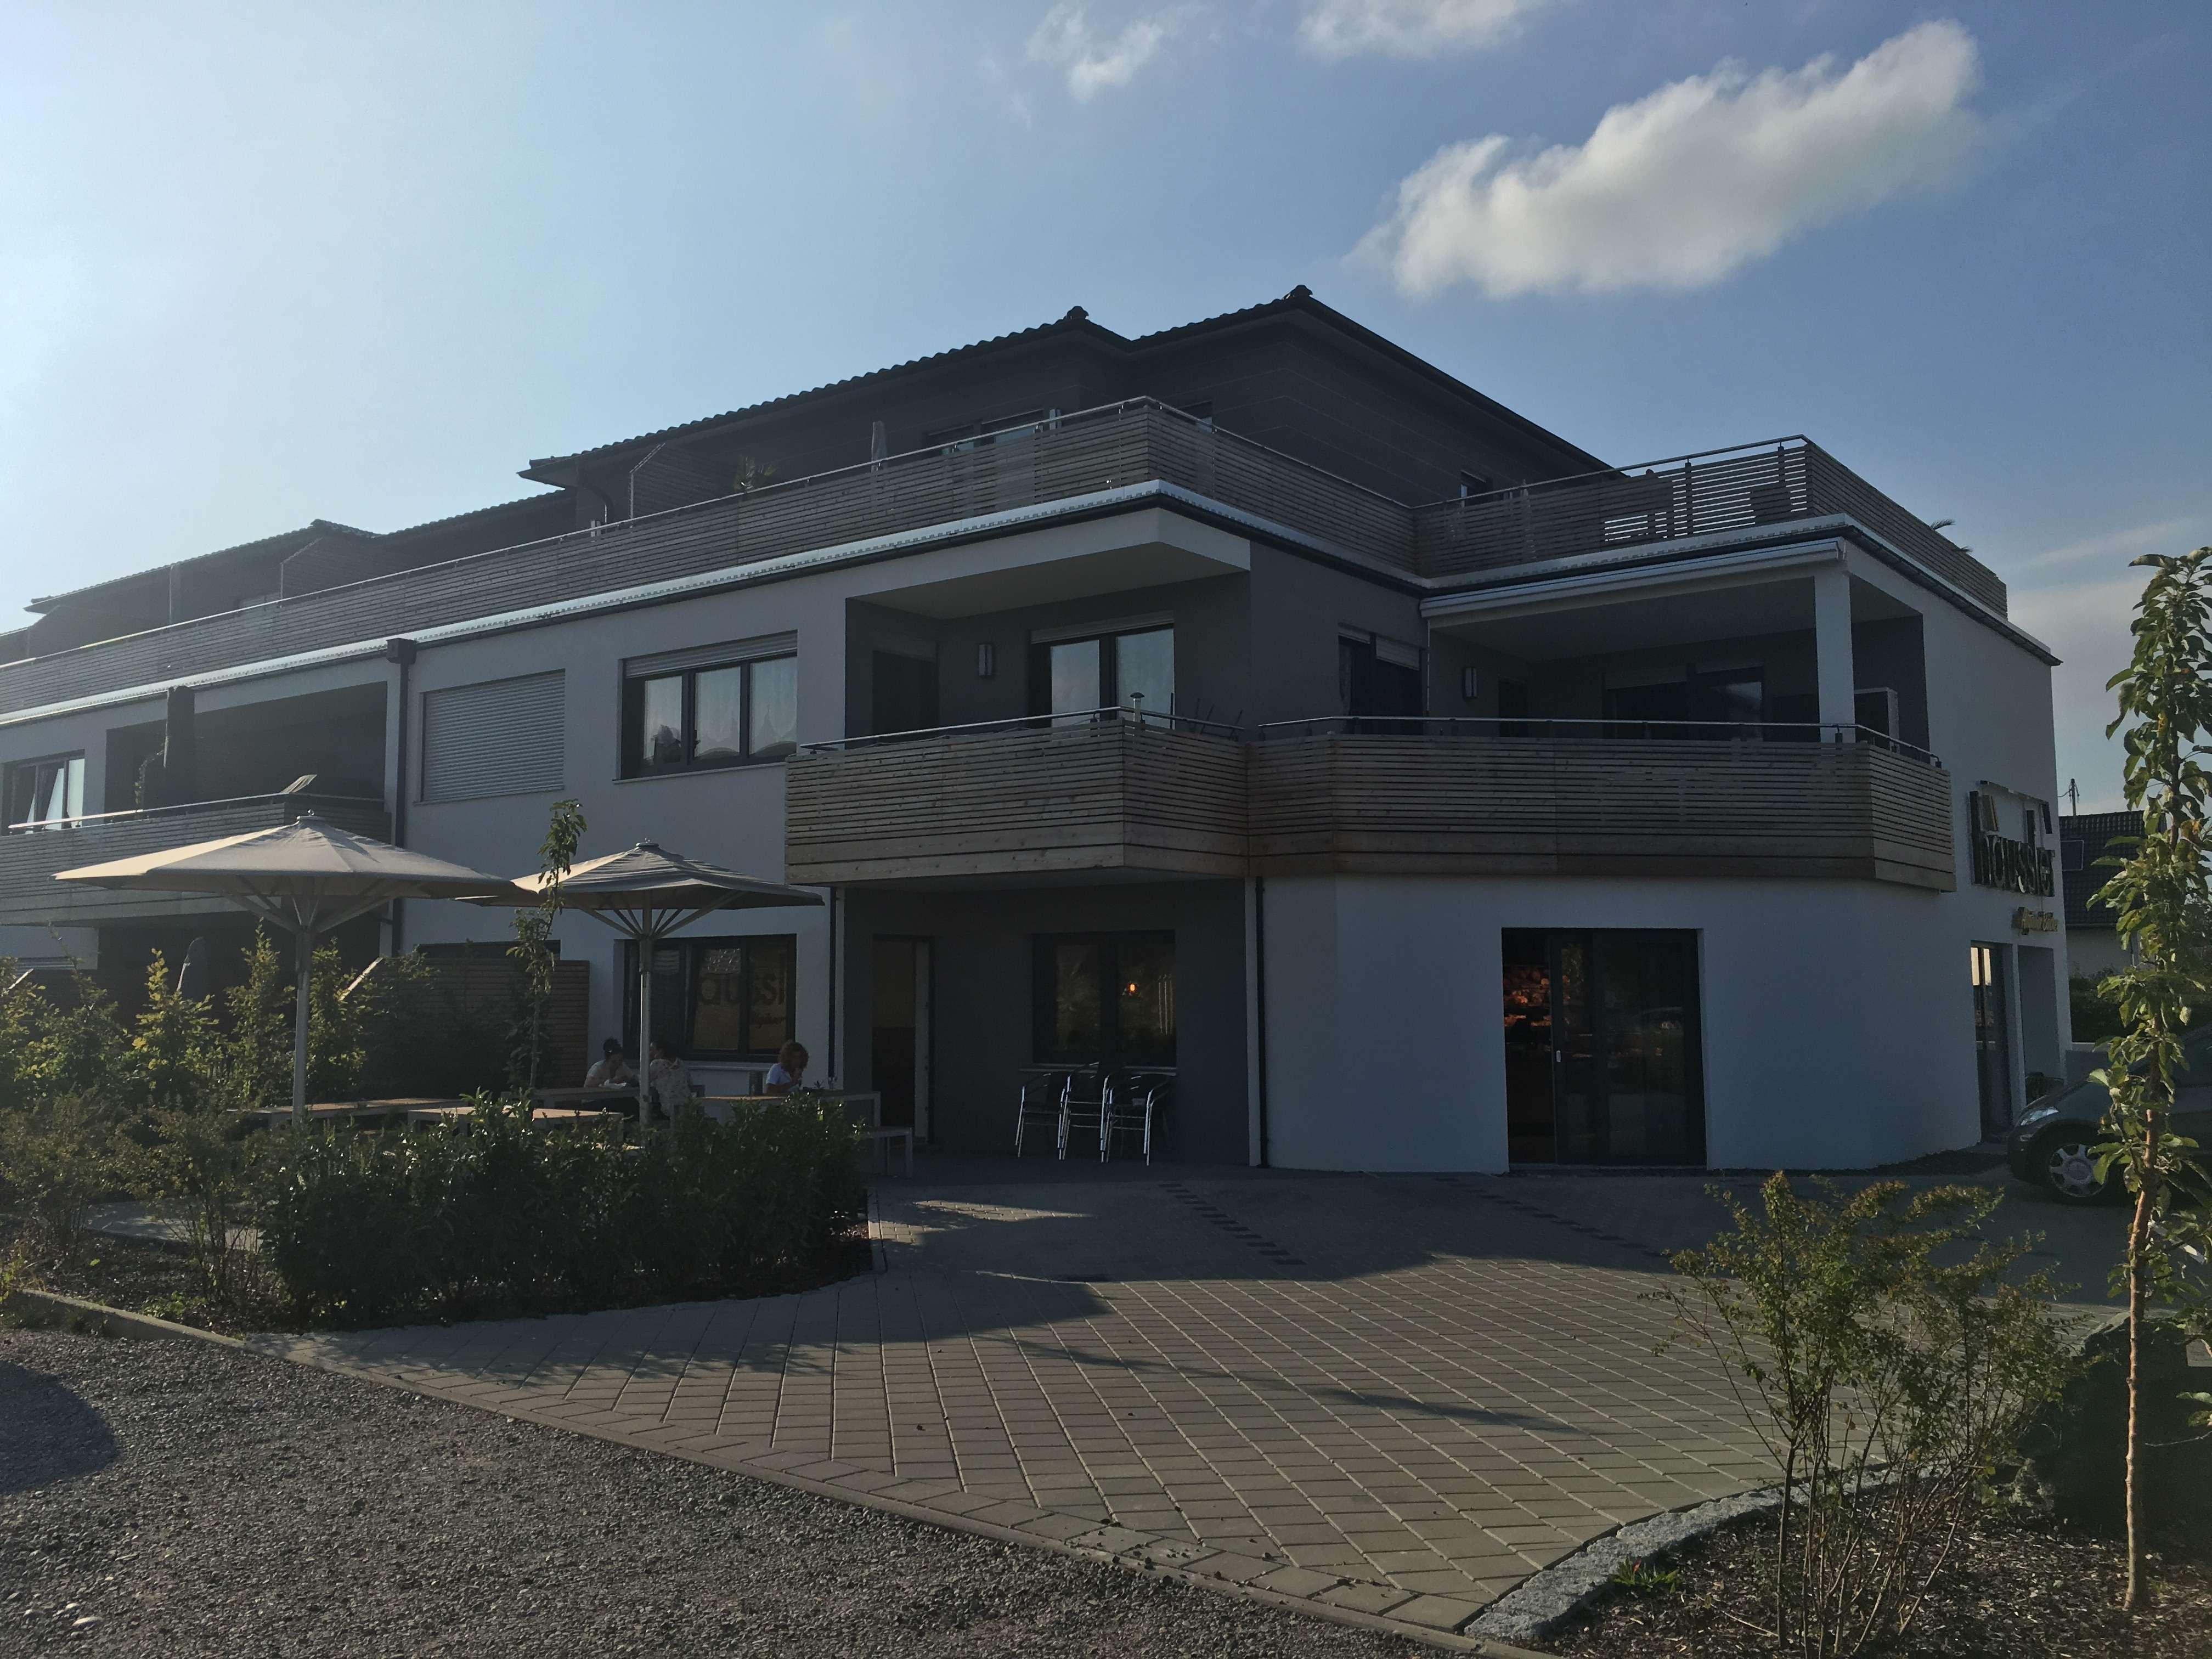 Großzügige 4-Zimmer-Wohnung in Amendingen in